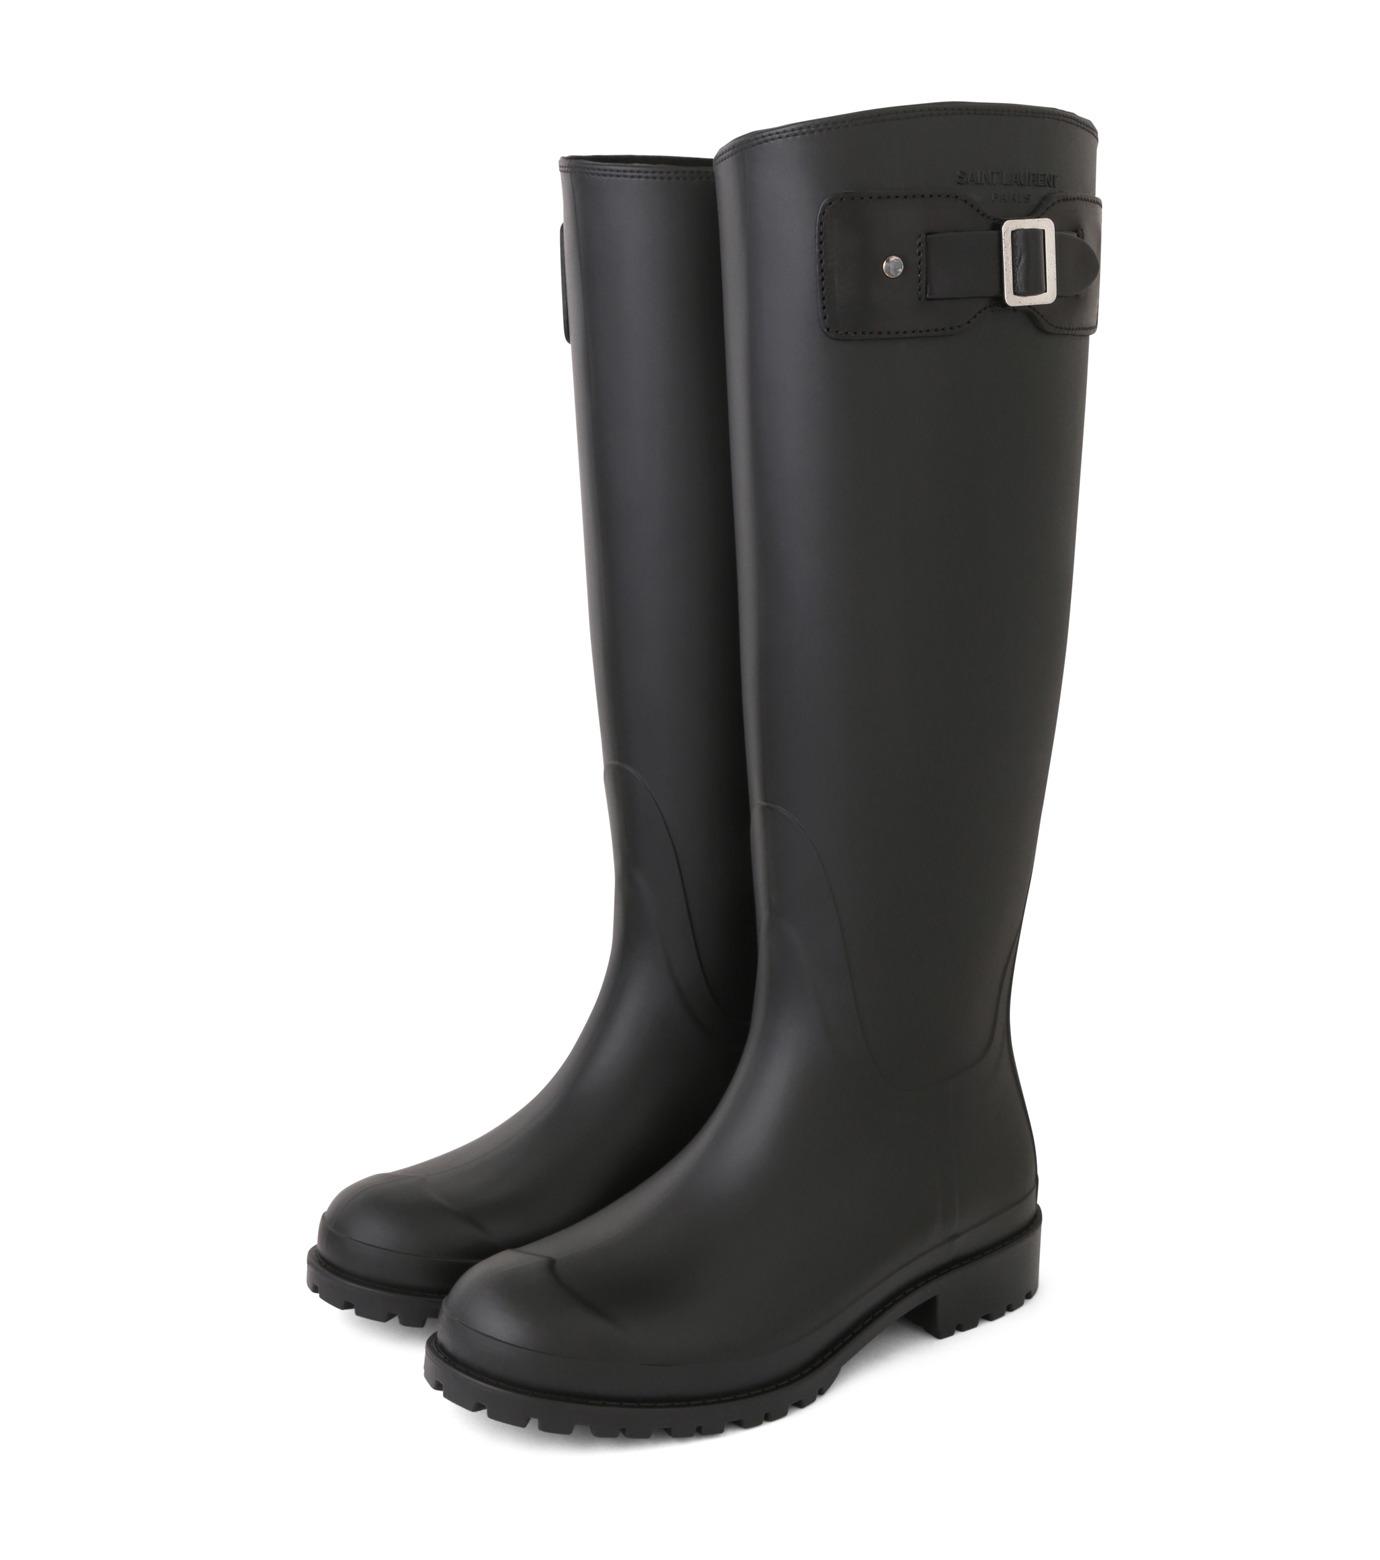 SAINT LAURENT(サンローラン)のRain Boots-BLACK(シューズ/shoes)-427315-GQN10-13 拡大詳細画像3